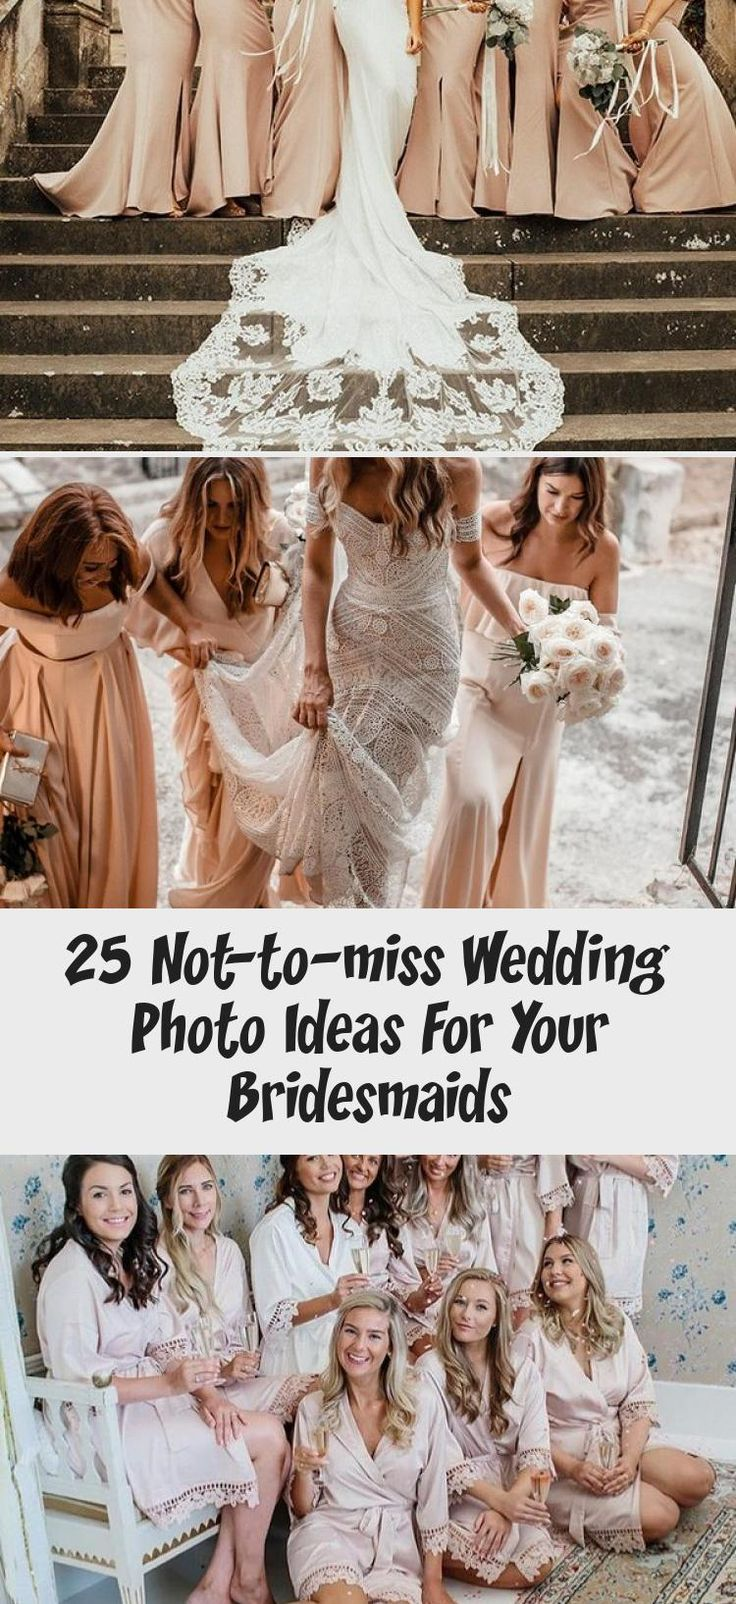 Wedding Photo Ideas For Your Bridesmaids  #wedding #weddingideas #weddingphotos #deerpearlflowers #BridesmaidDressesCoral #GoldBridesmaidDresses #CasualBridesmaidDresses #JuniorBridesmaidDresses #BridesmaidDressesMismatched